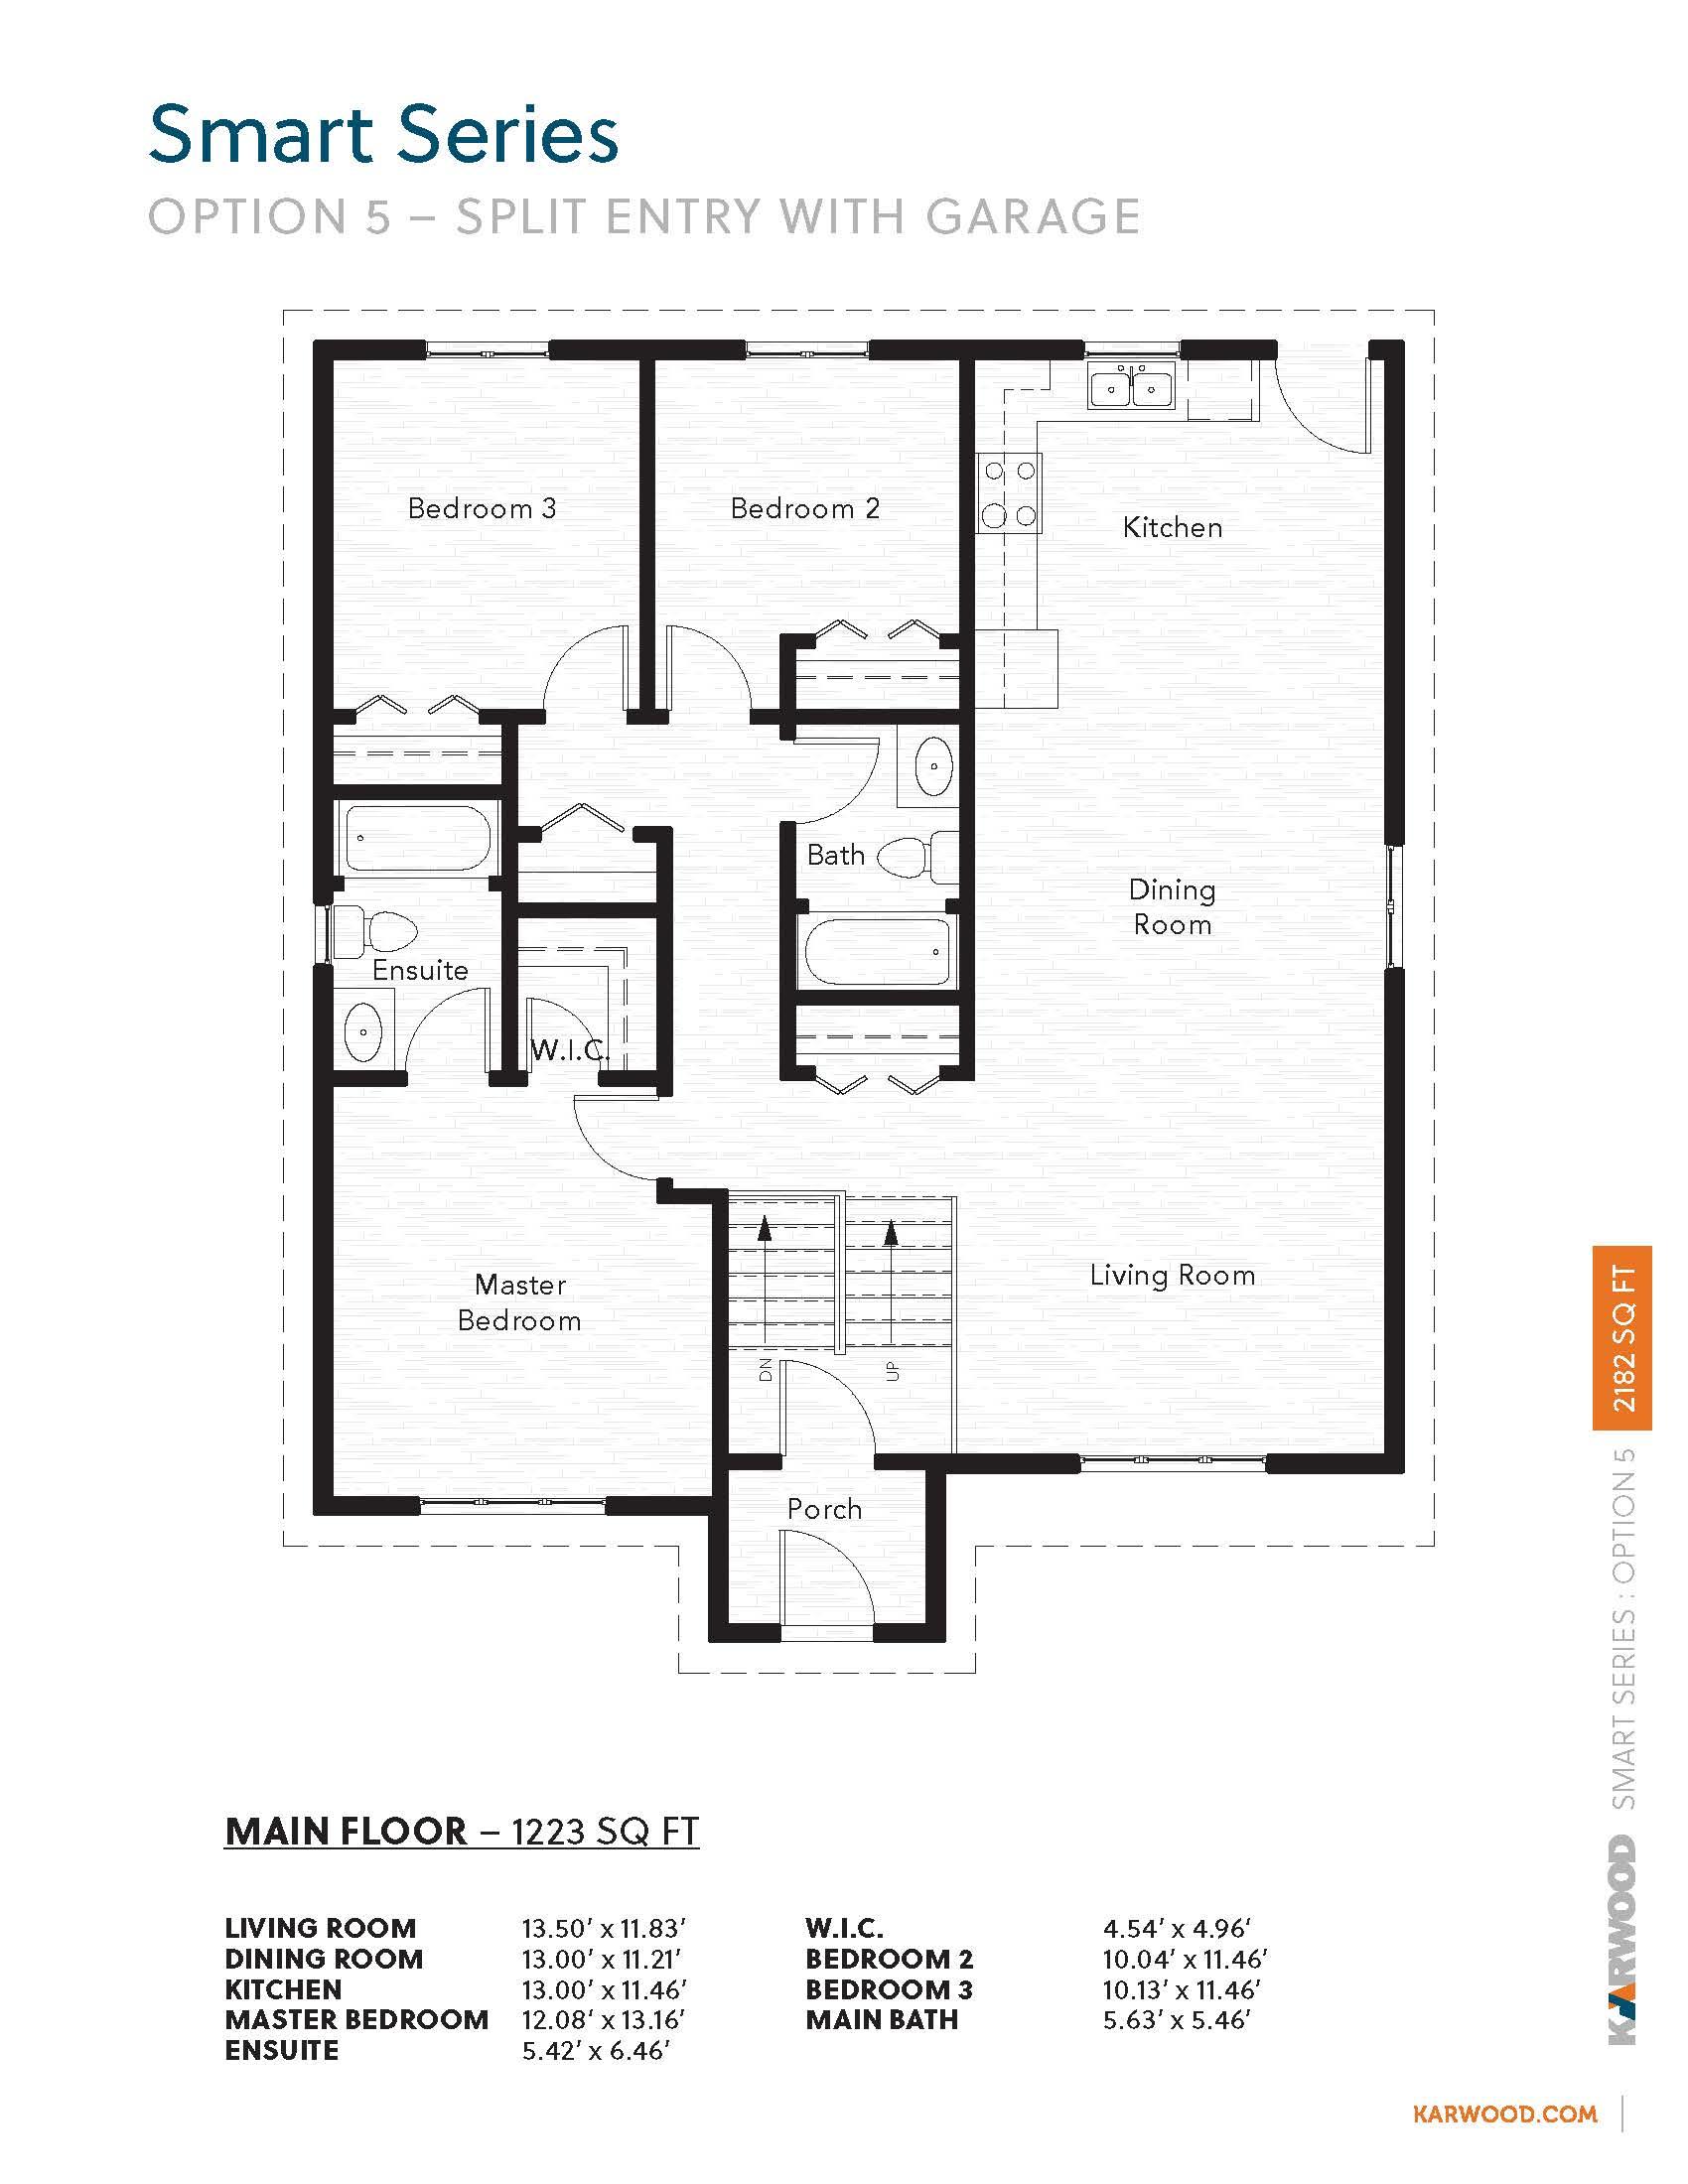 Option5-SplitEntryGarage-SmartSeries-Plans_Page_3.jpg